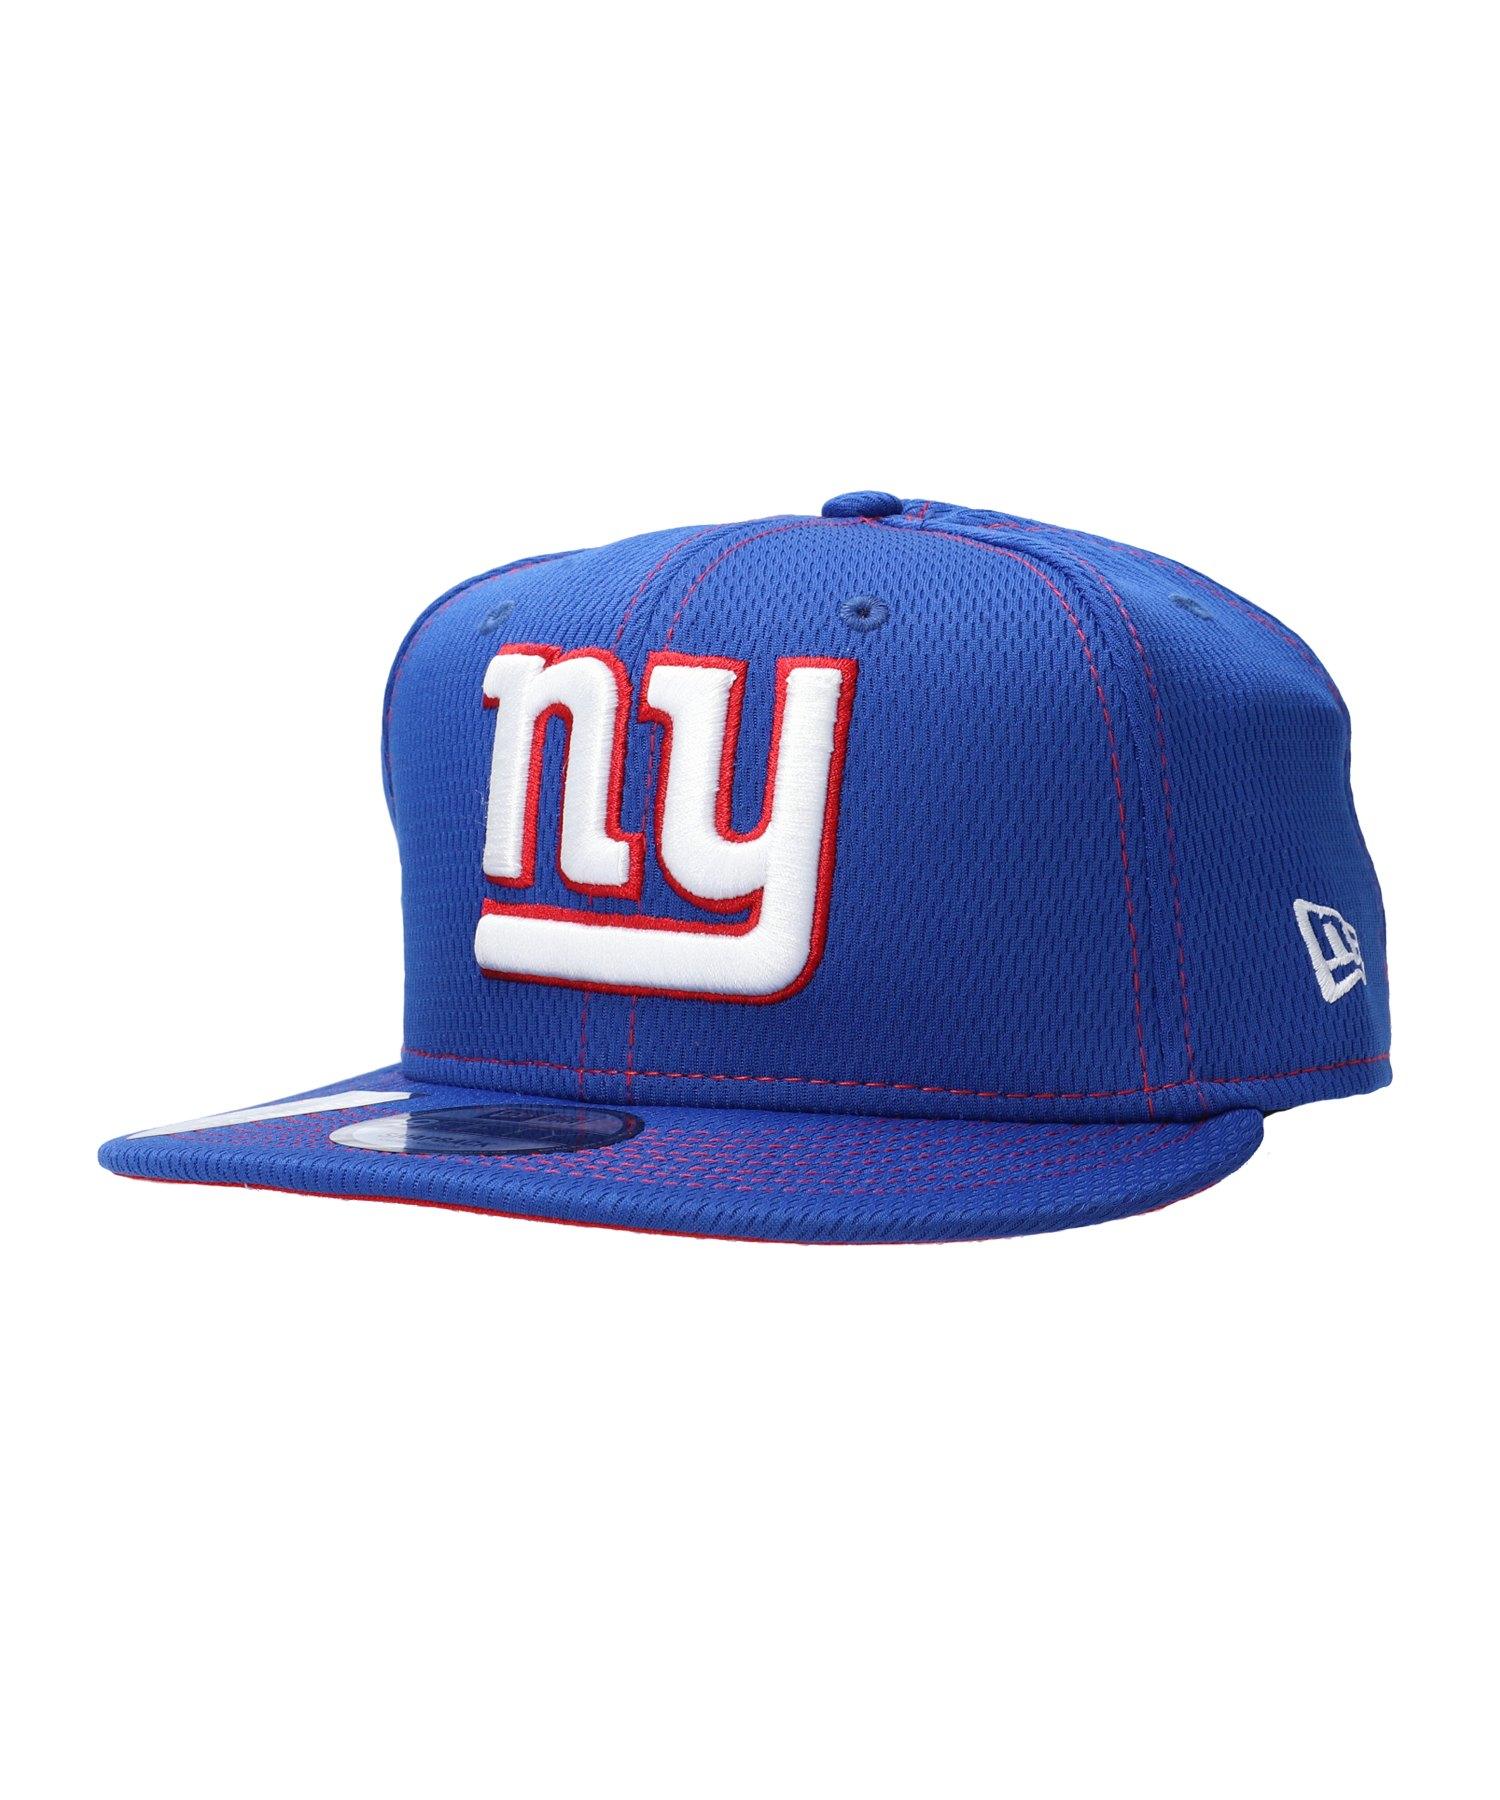 New Era NFL New York Giants 9Fifty OTC Cap Blau - blau